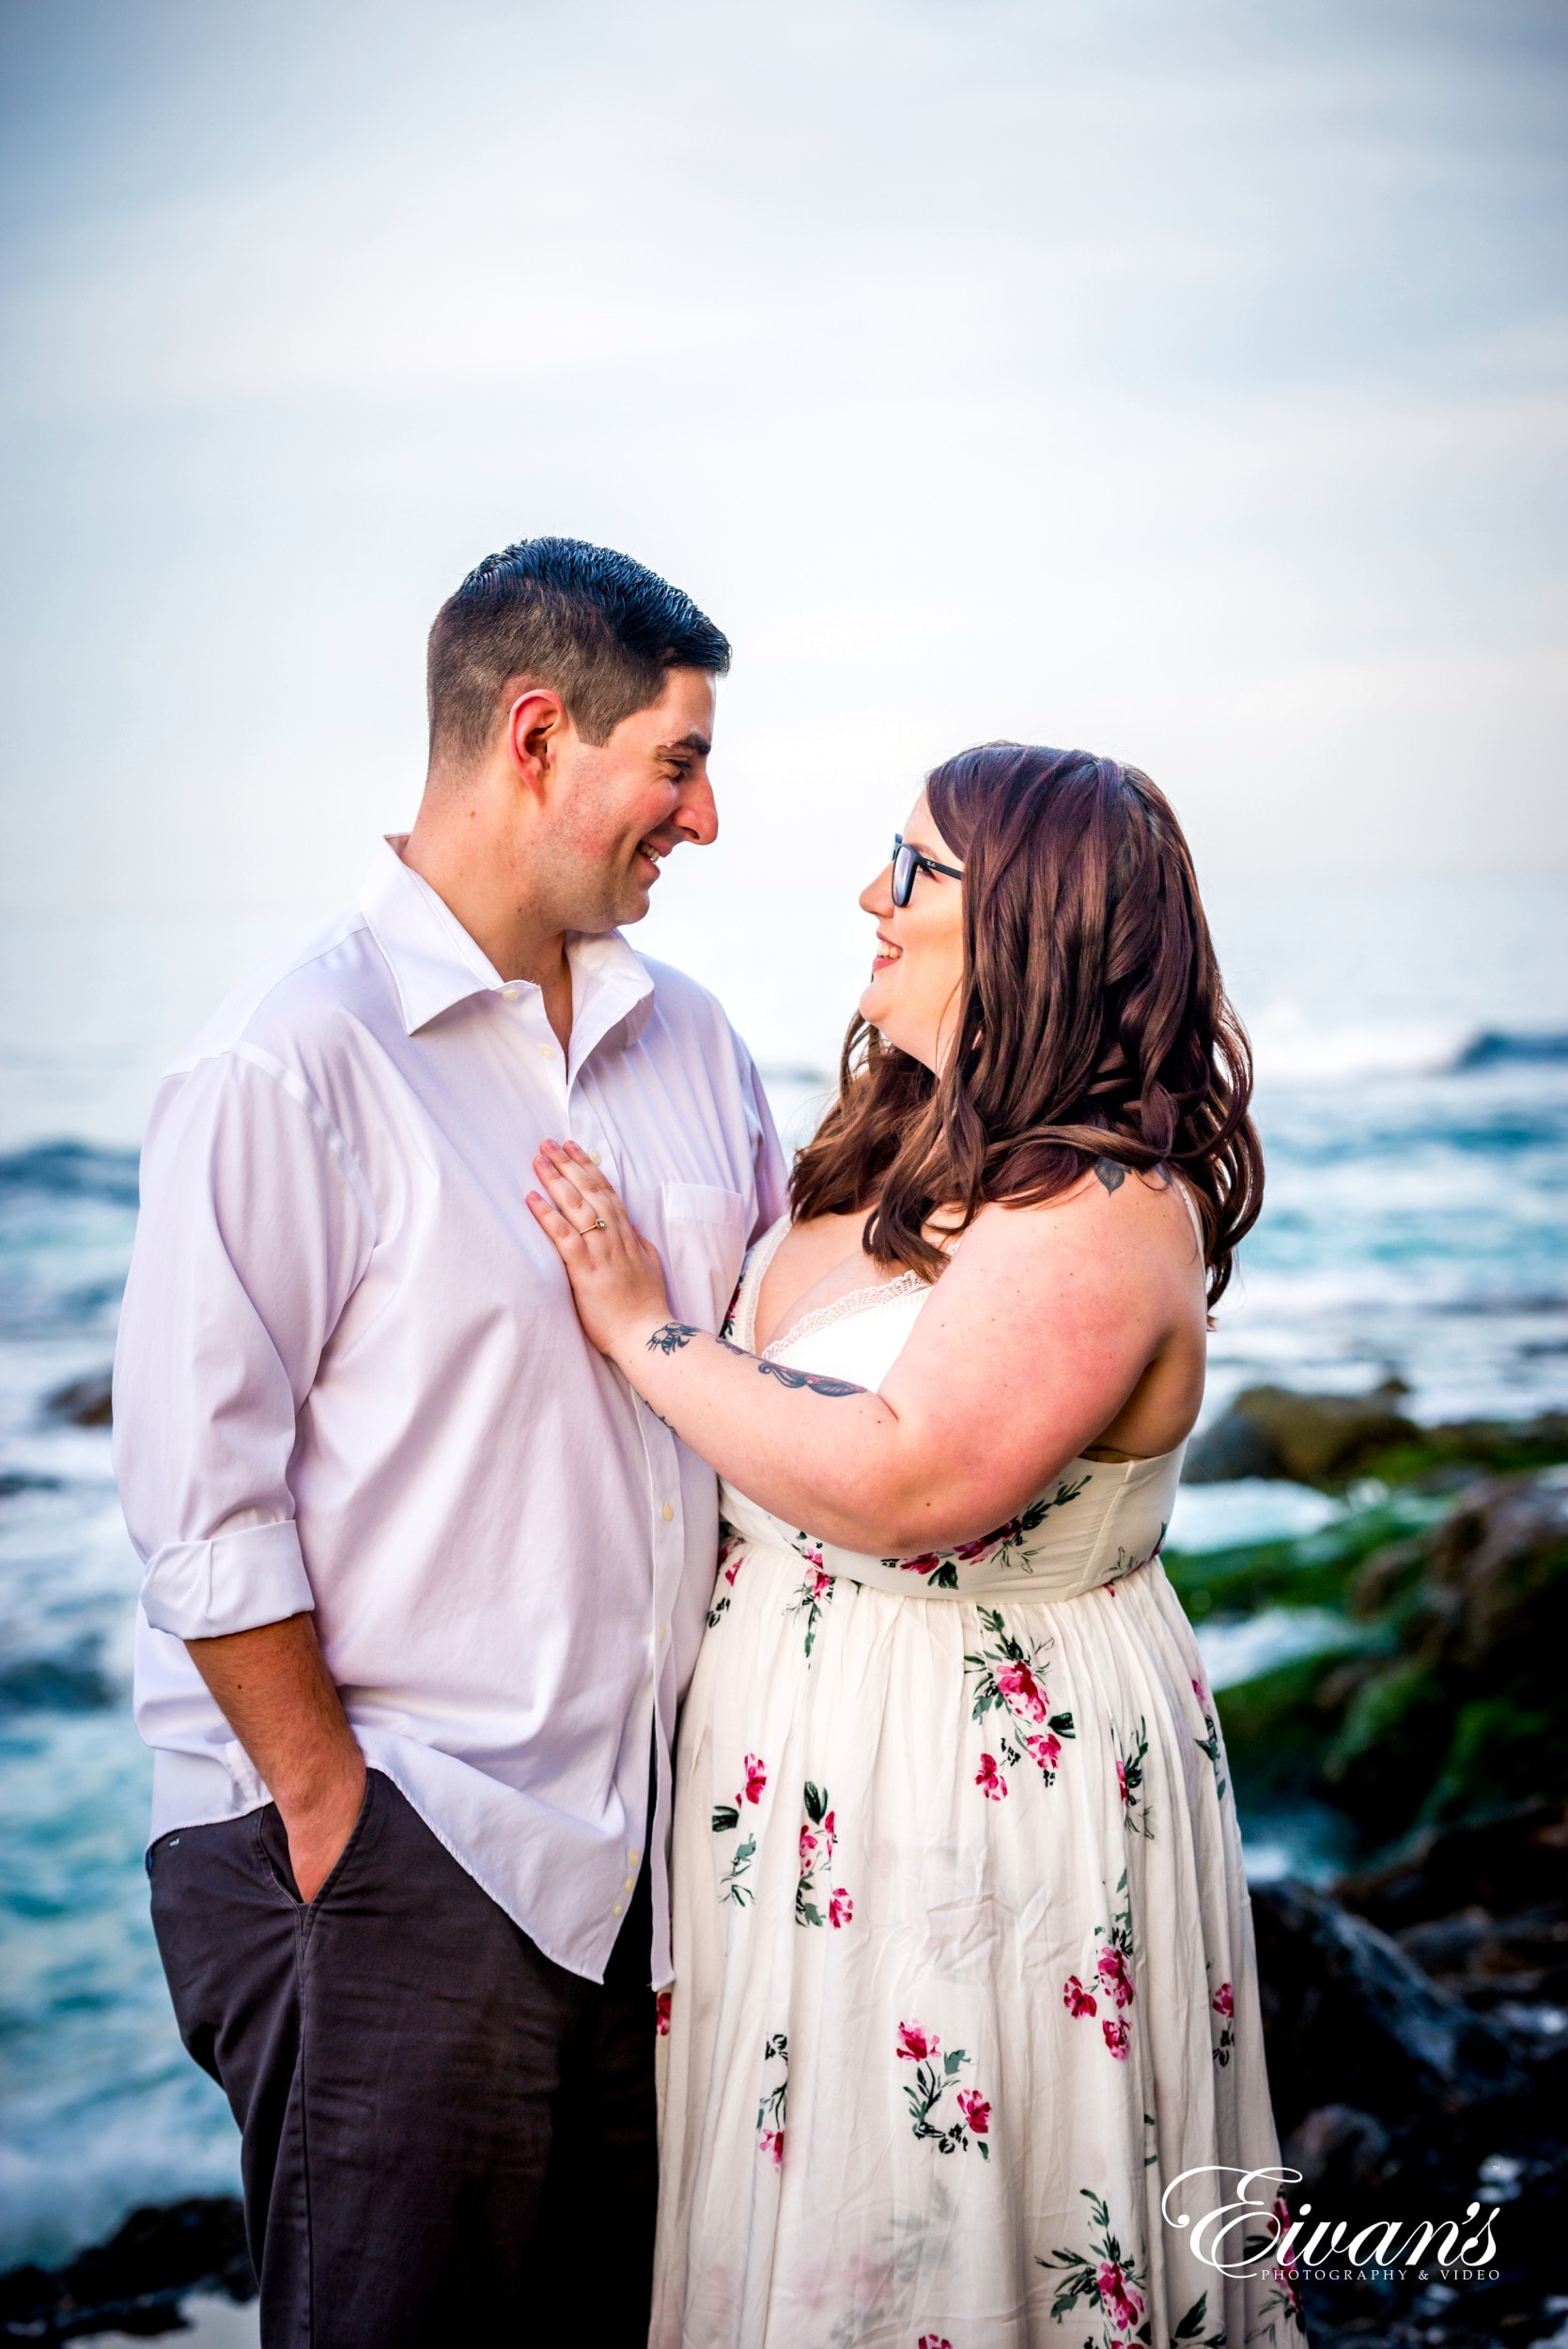 man in white dress shirt kissing woman in white floral dress